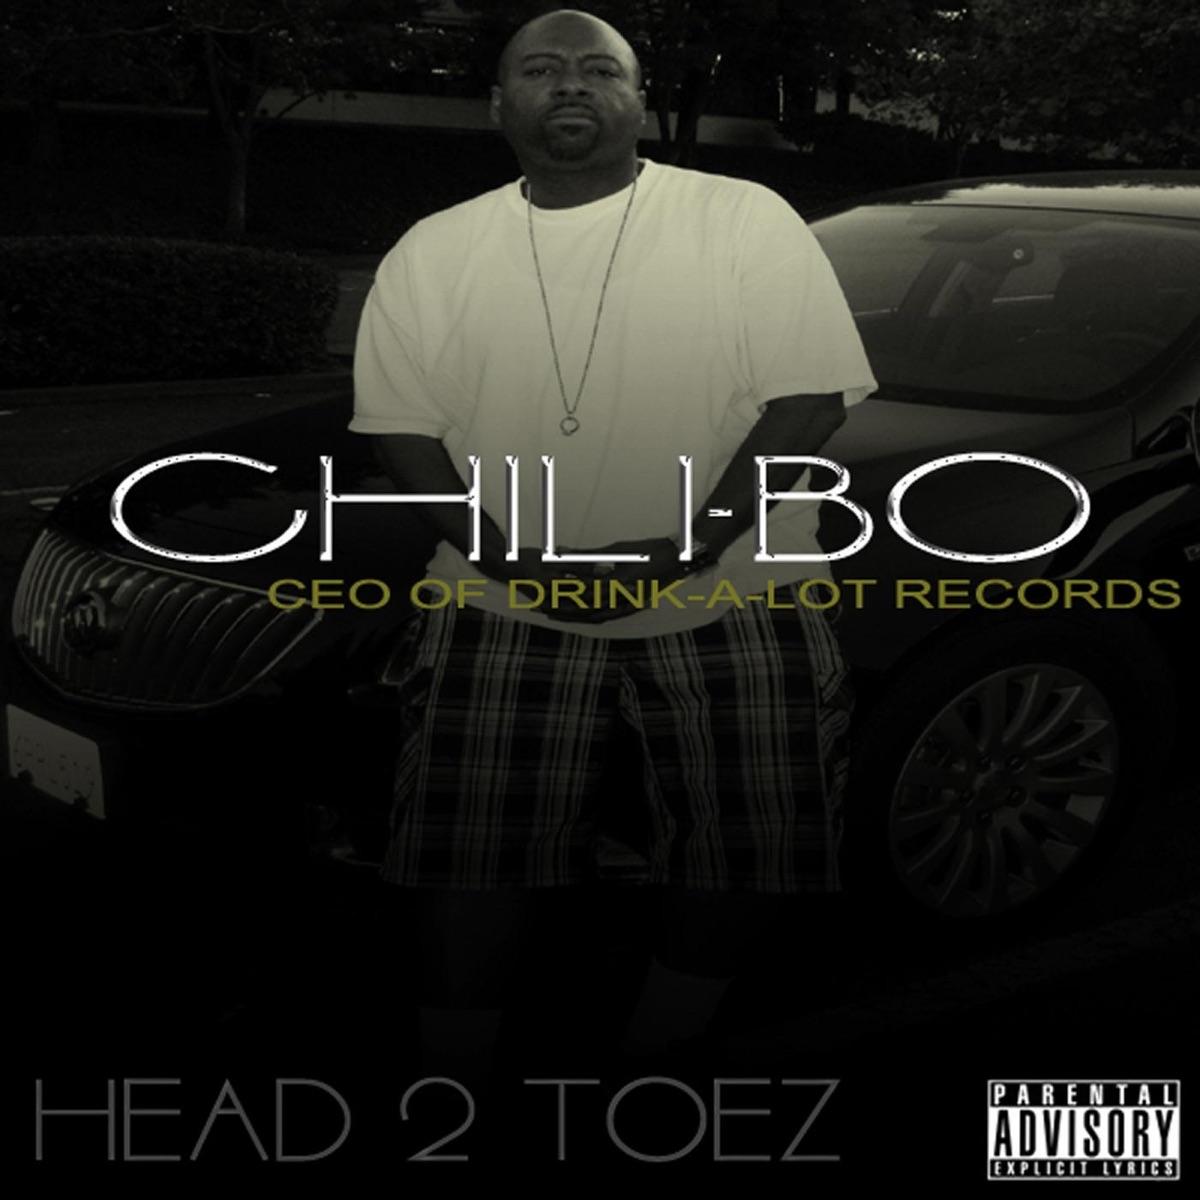 Head 2 Toez - Single Chili-Bo CD cover